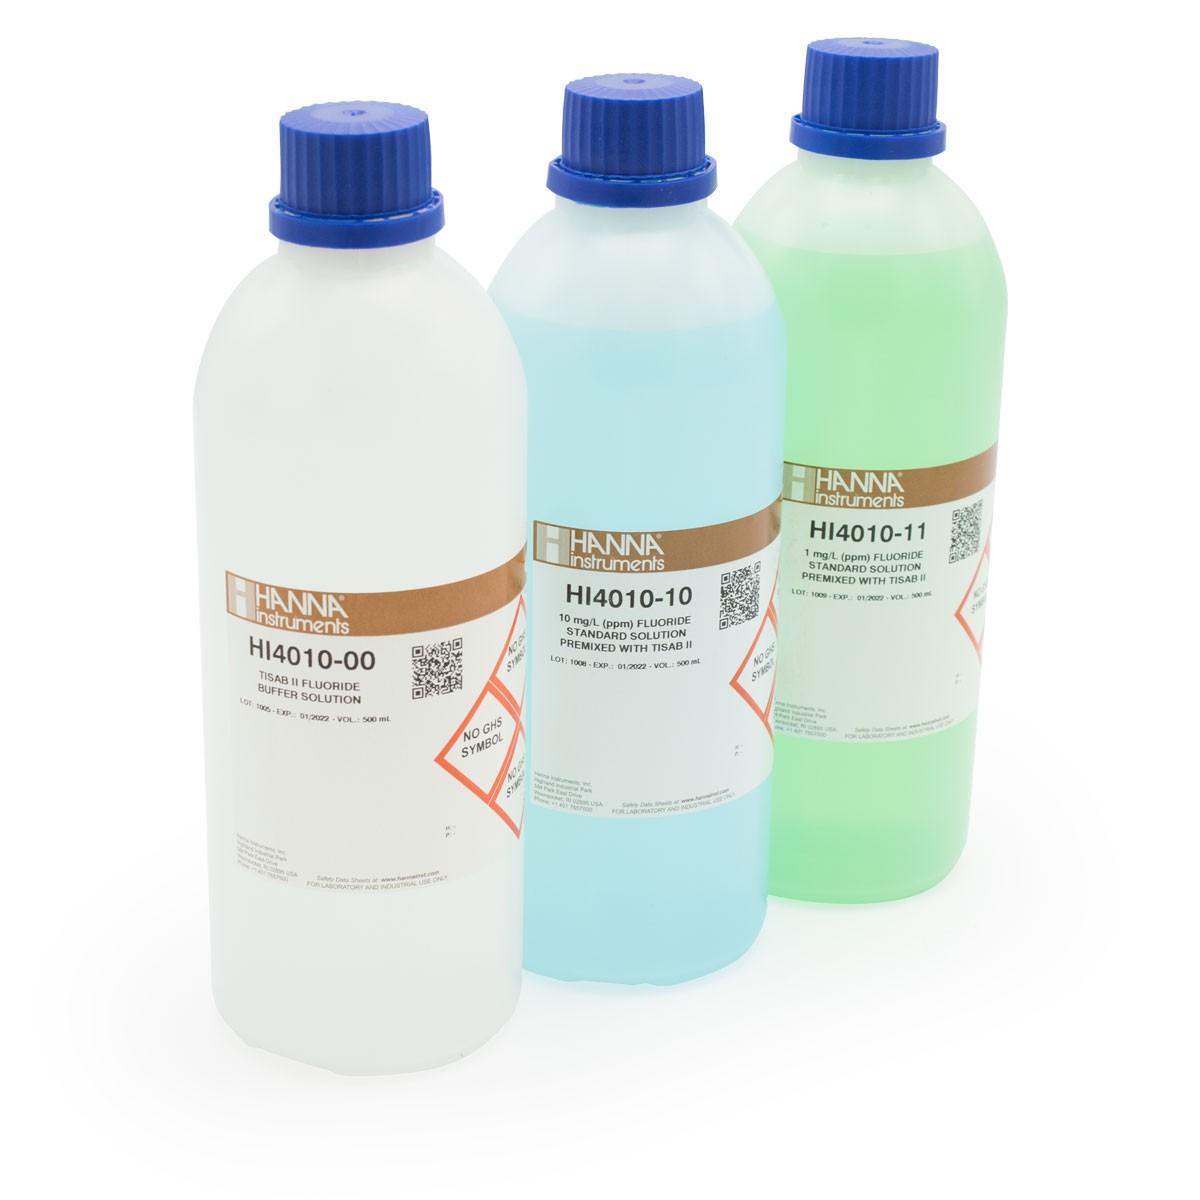 Fluoride Calibration Solution Kit - HI4010-30